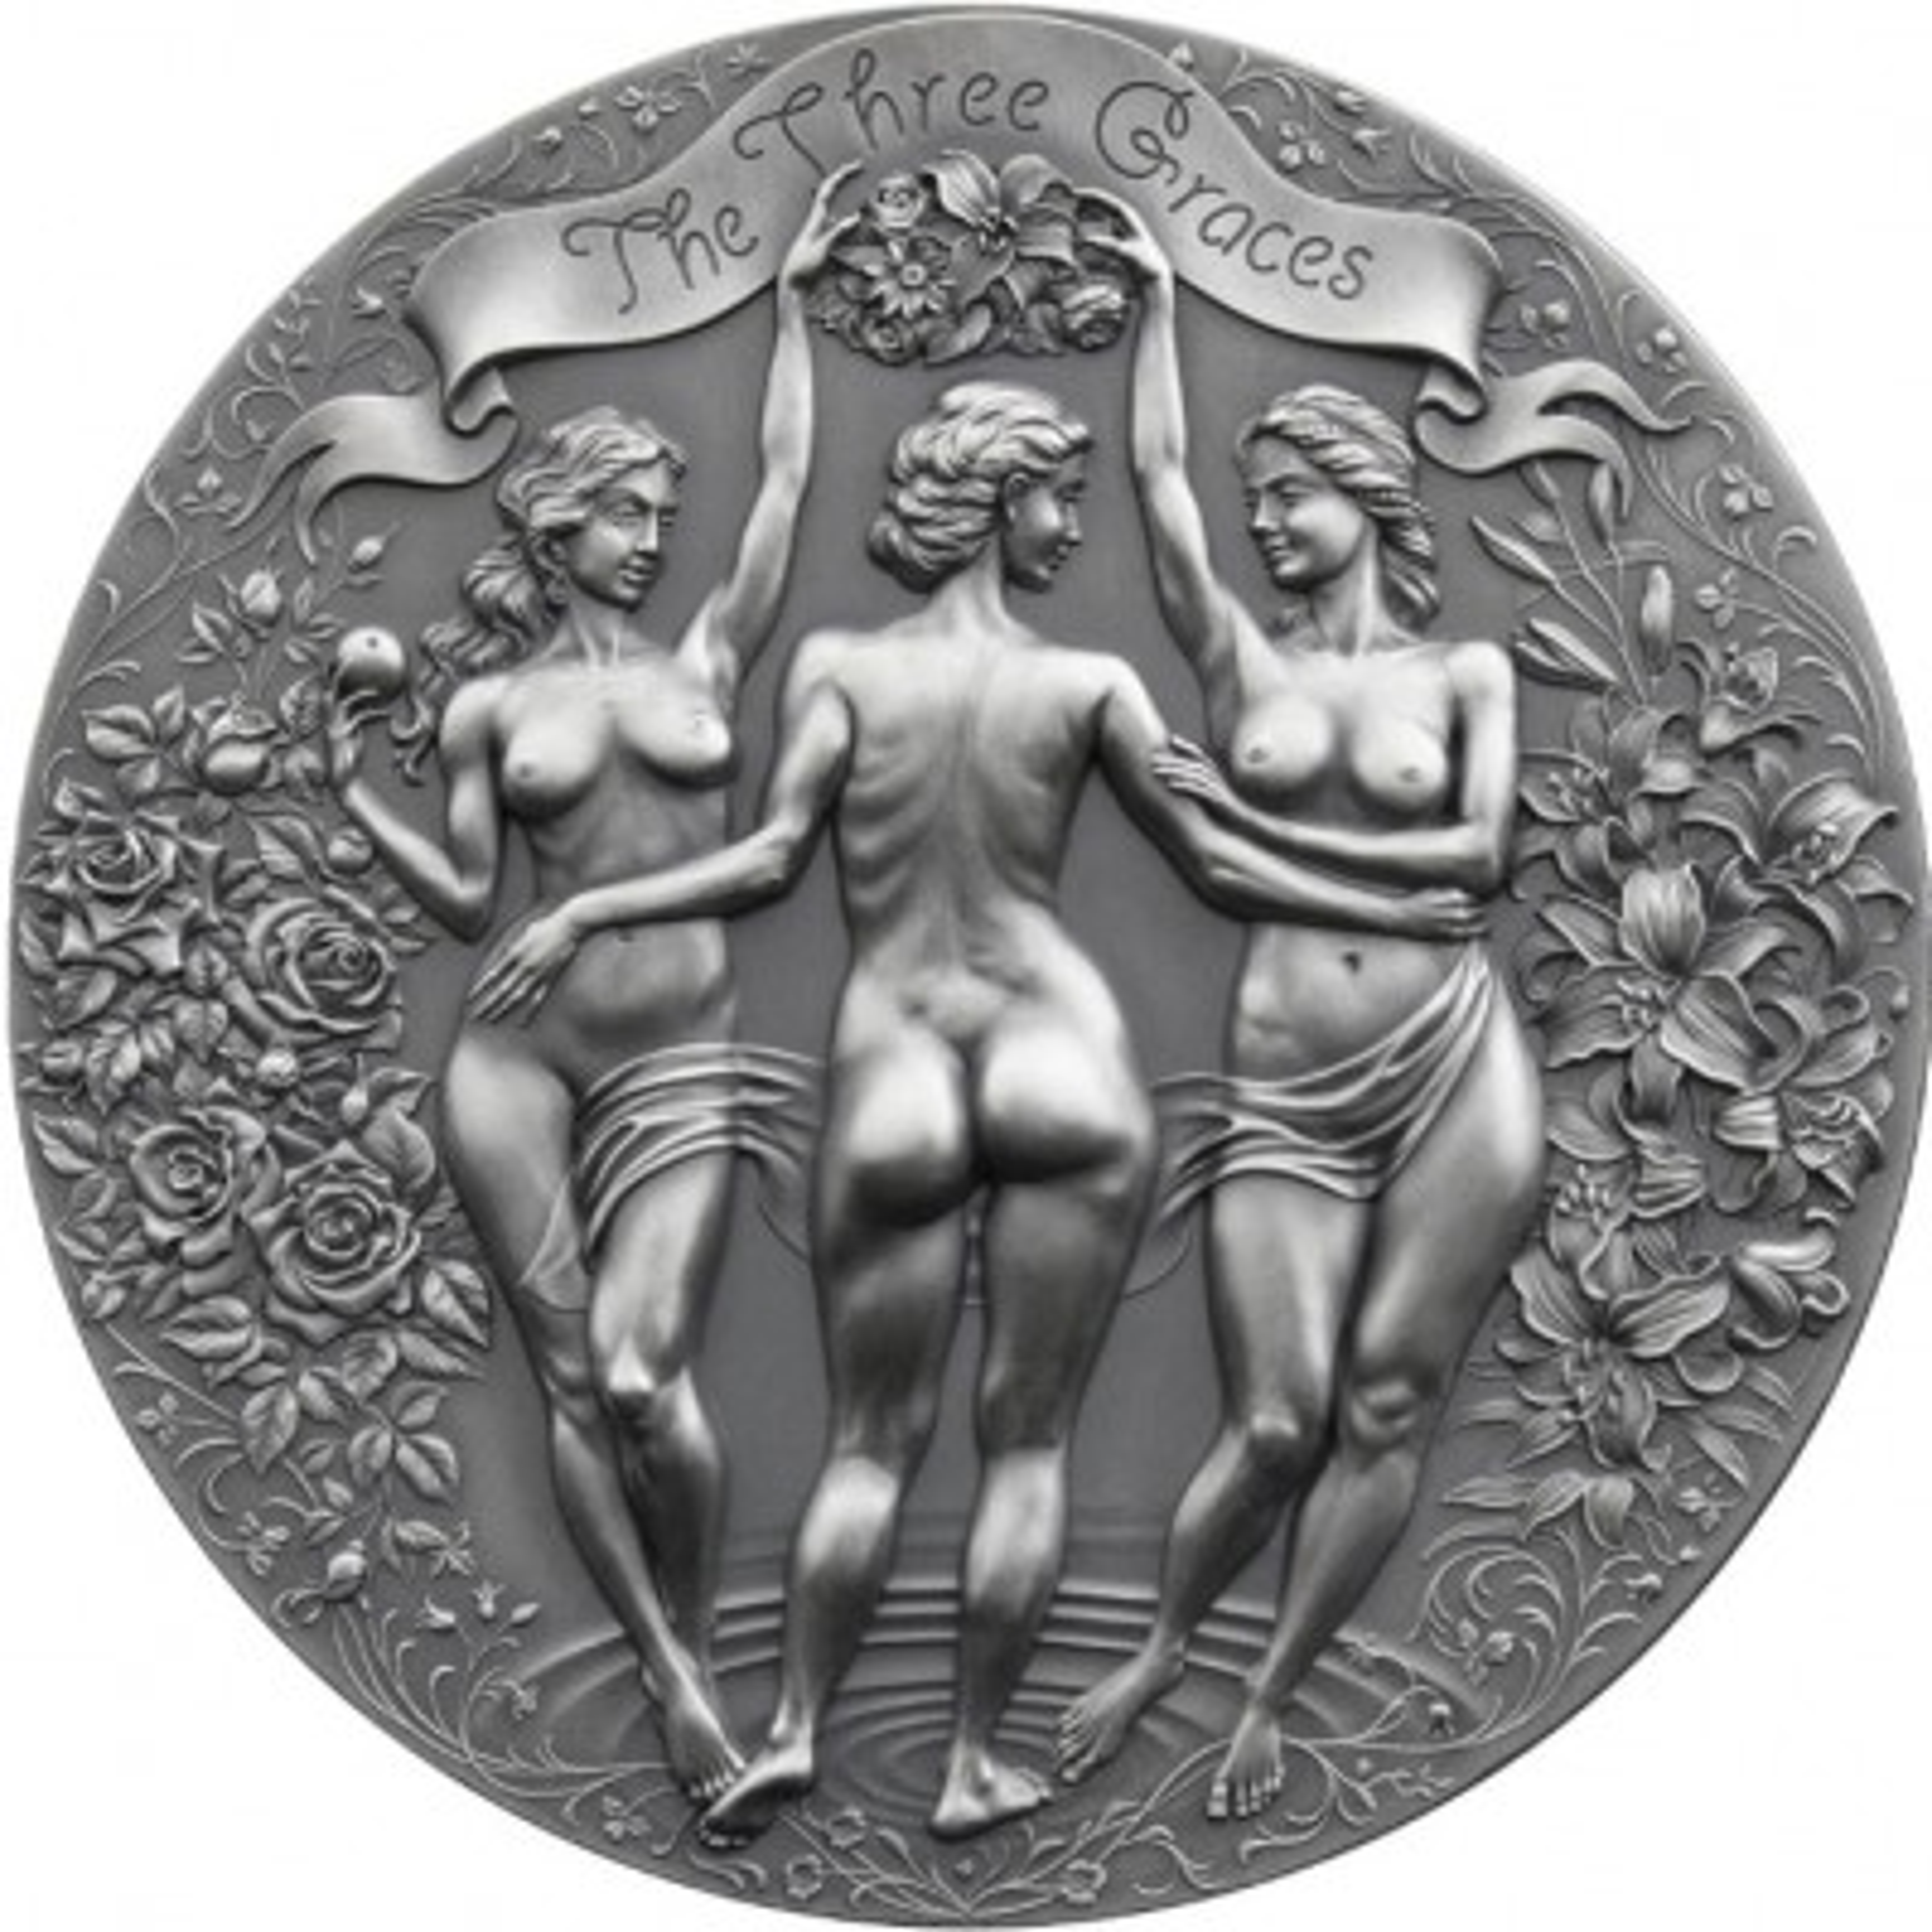 2 troy ounce zilveren munt Three Graces 2020